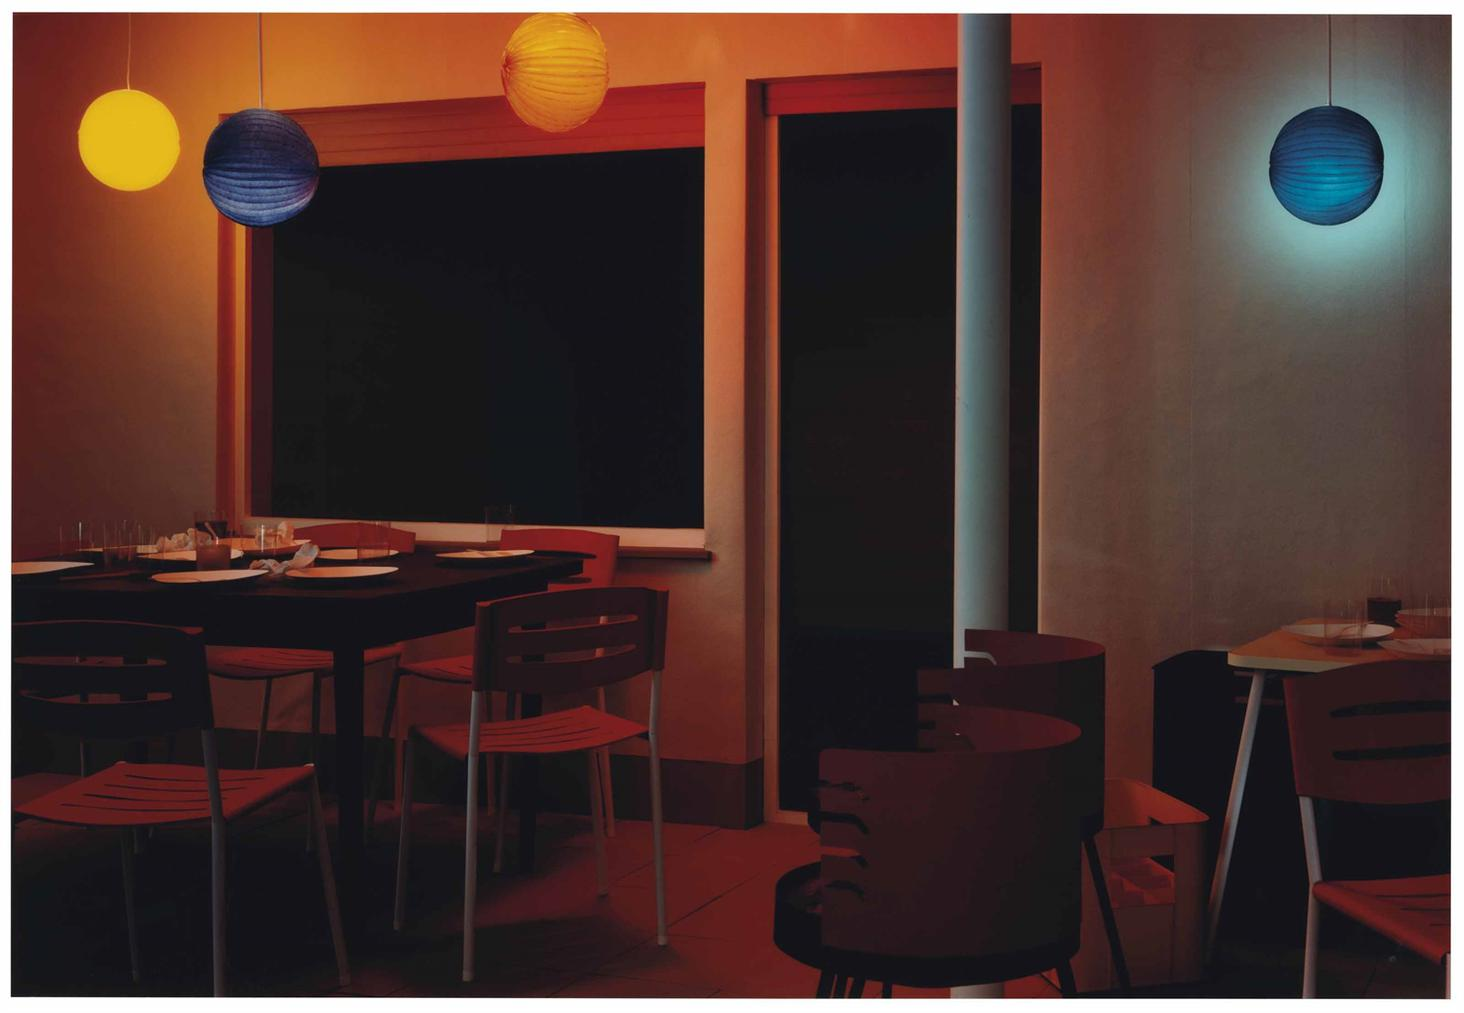 Thomas Demand-Terrasse-1998